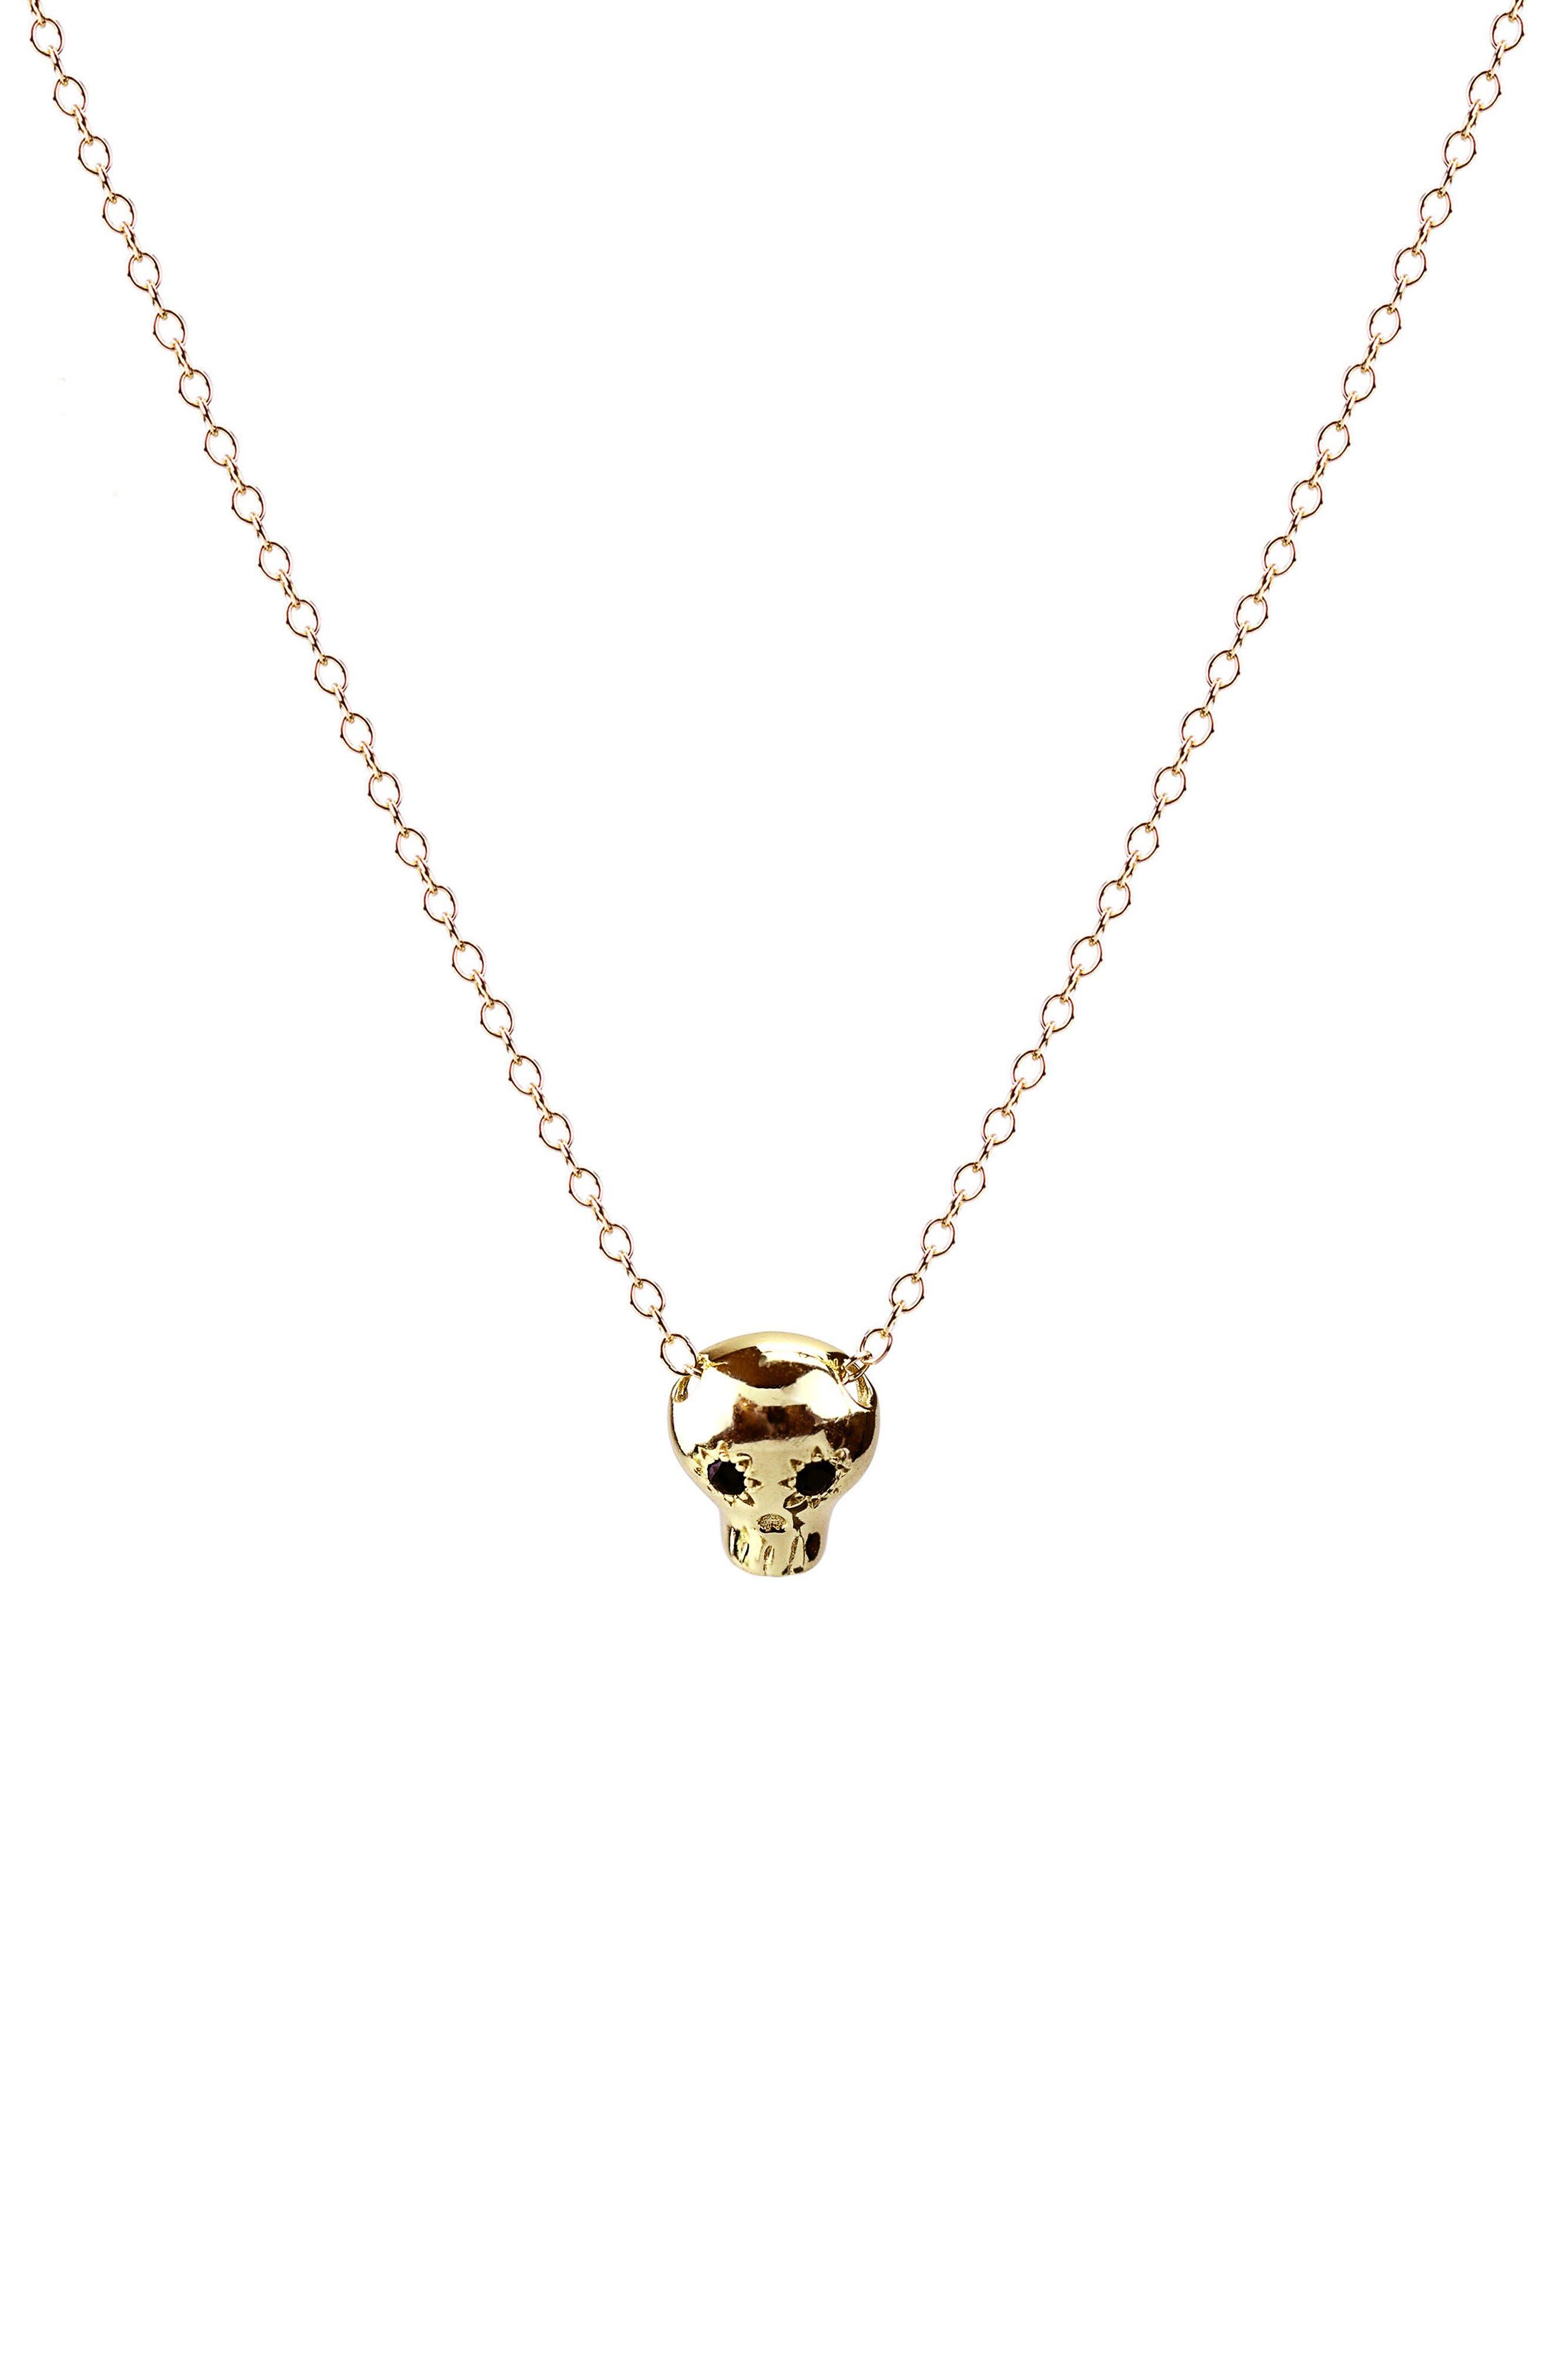 Onyx Skull Charm Necklace,                             Main thumbnail 1, color,                             001